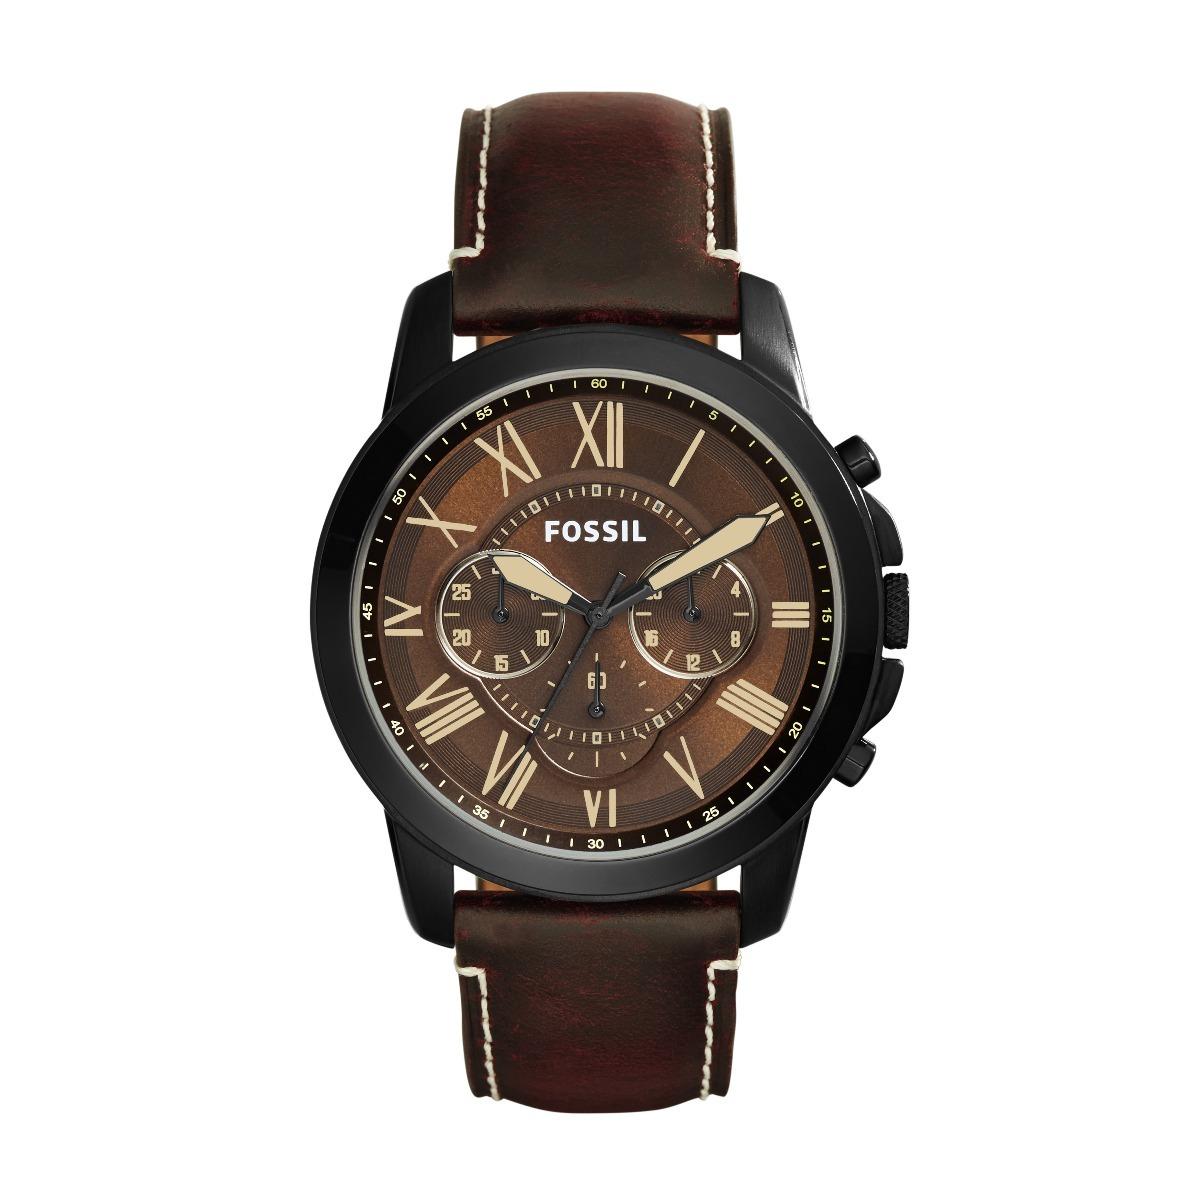 0ed53f60b9f5 reloj fossil hombre fs5088 agente oficial envio gratis. Cargando zoom.